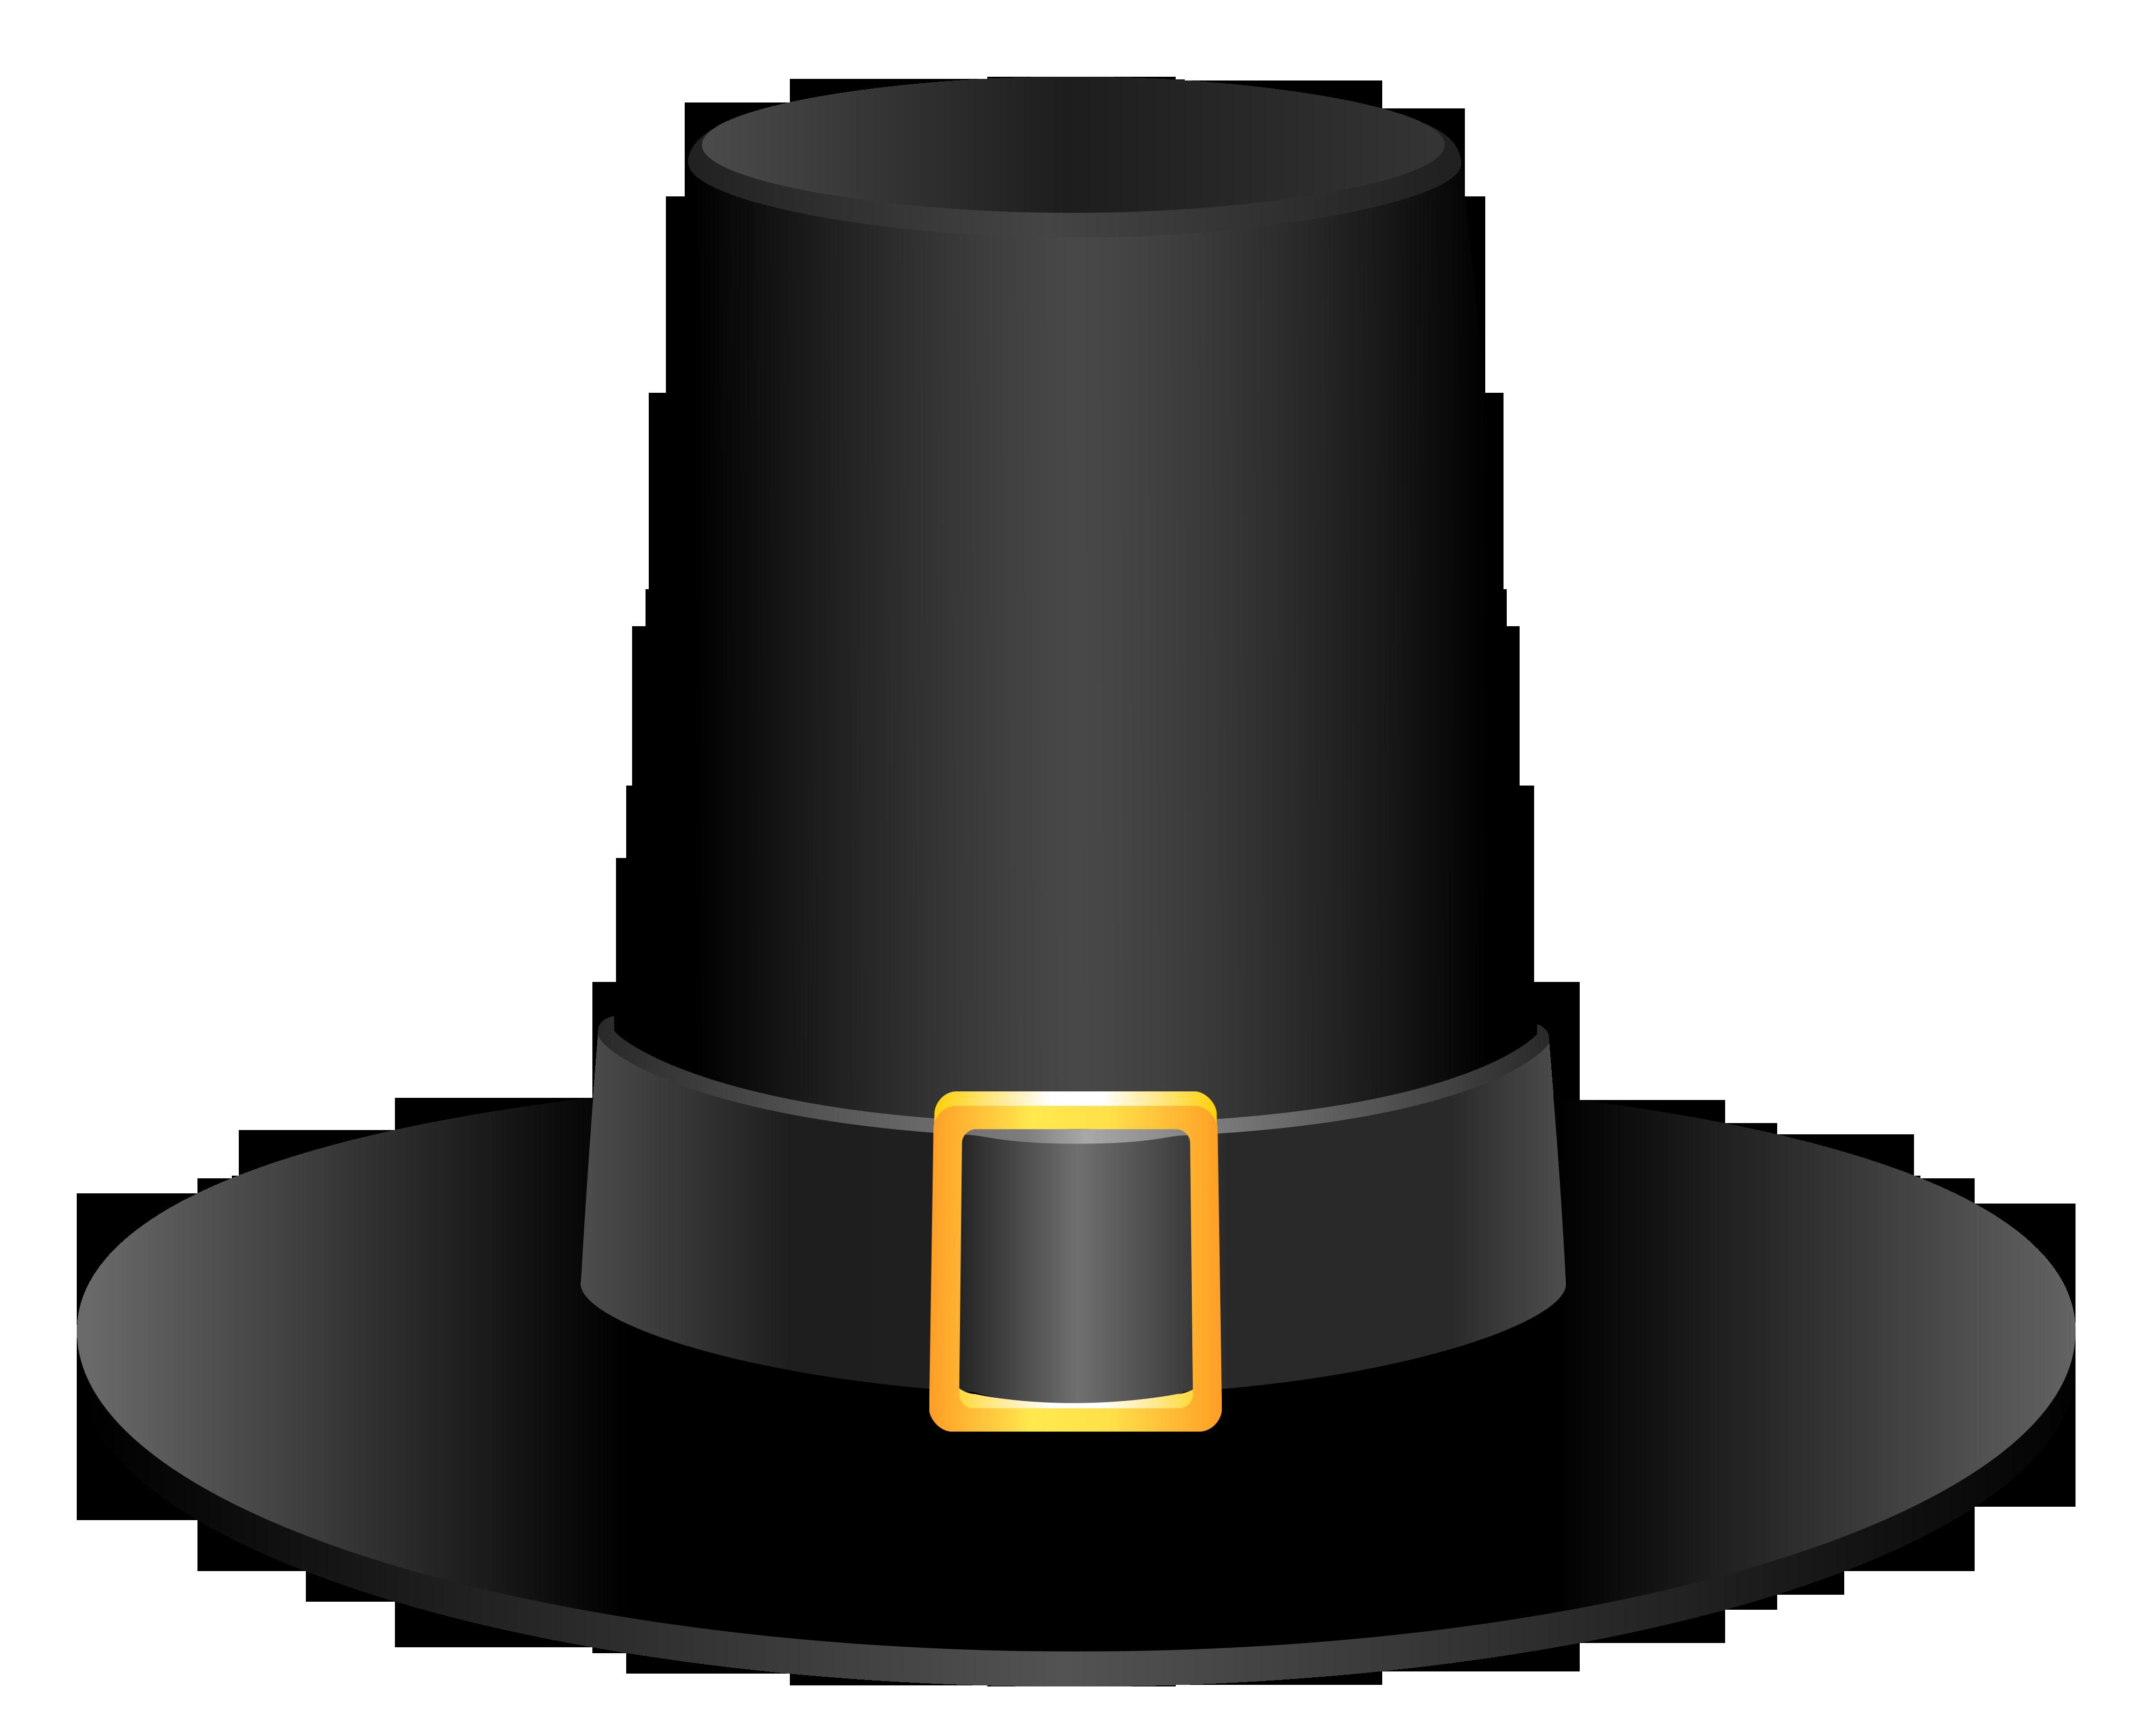 Free Pilgrim Hat Png, Download Free Clip Art, Free Clip Art.